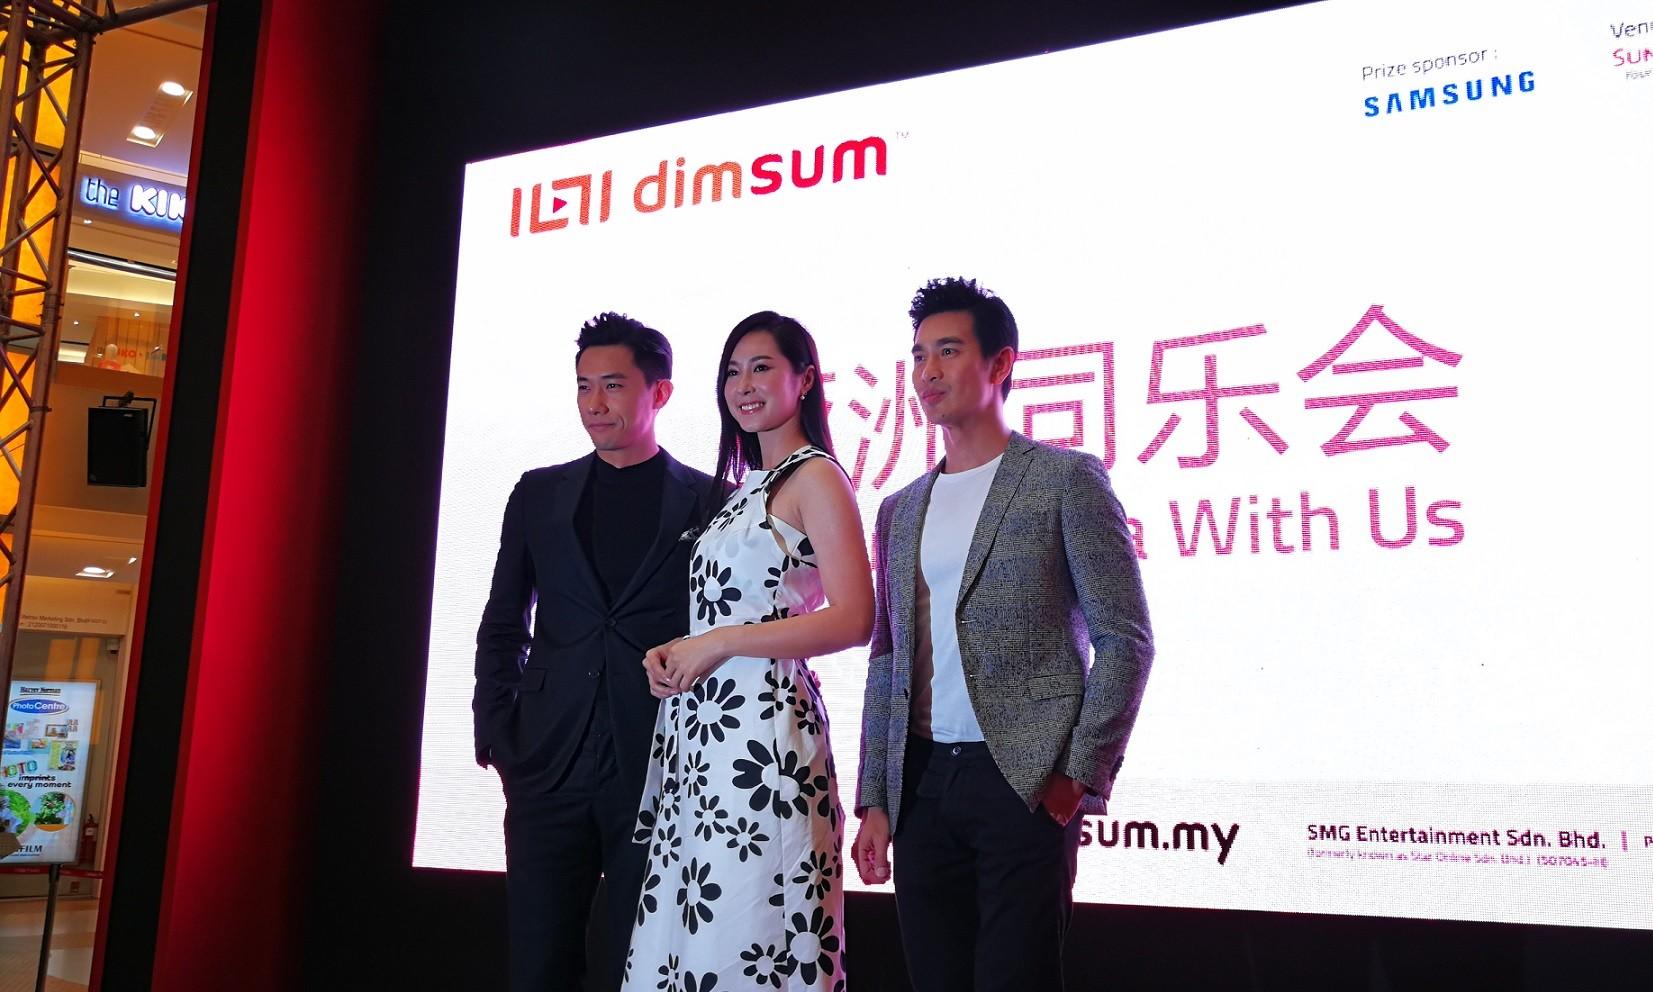 Dimsum reveals 4 new regional content partnerships | Marketing